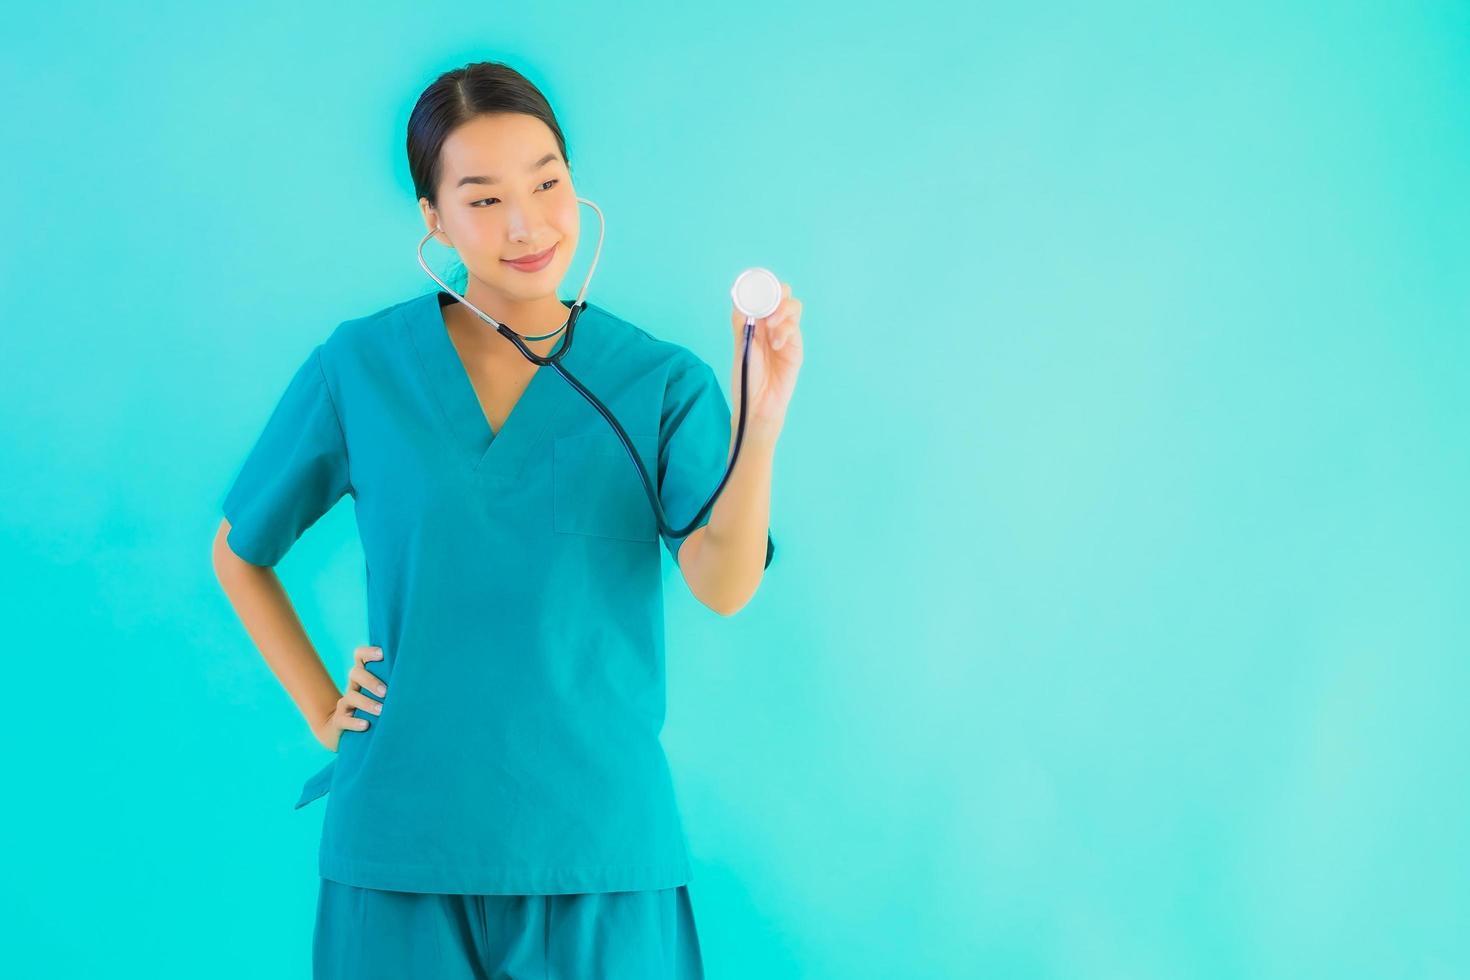 doctora sosteniendo estetoscopio foto